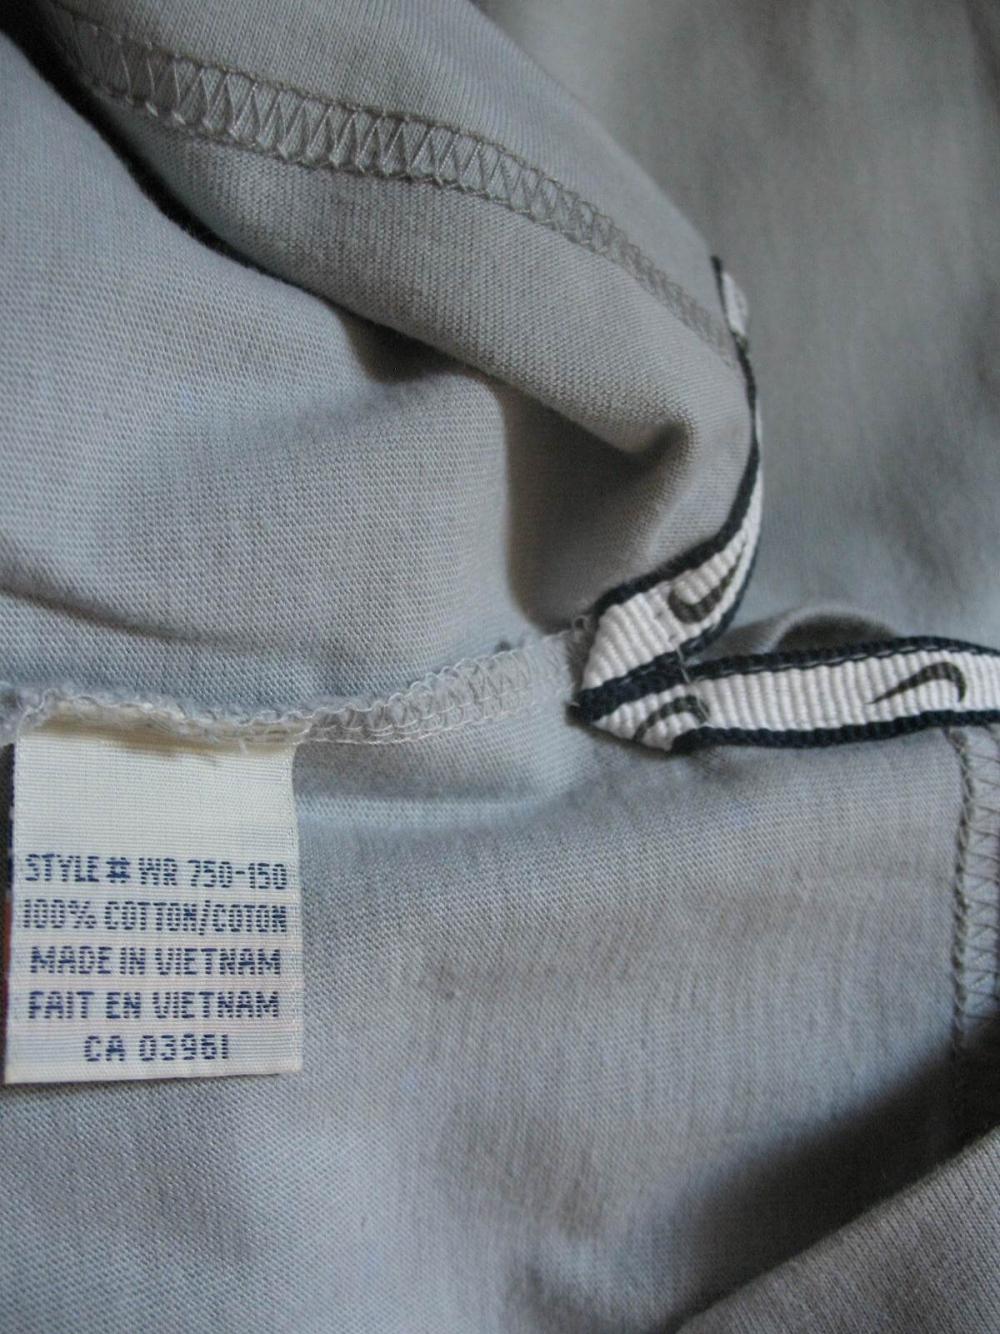 Футболка NIKE tennis polo shirt (размер S/M) - 3